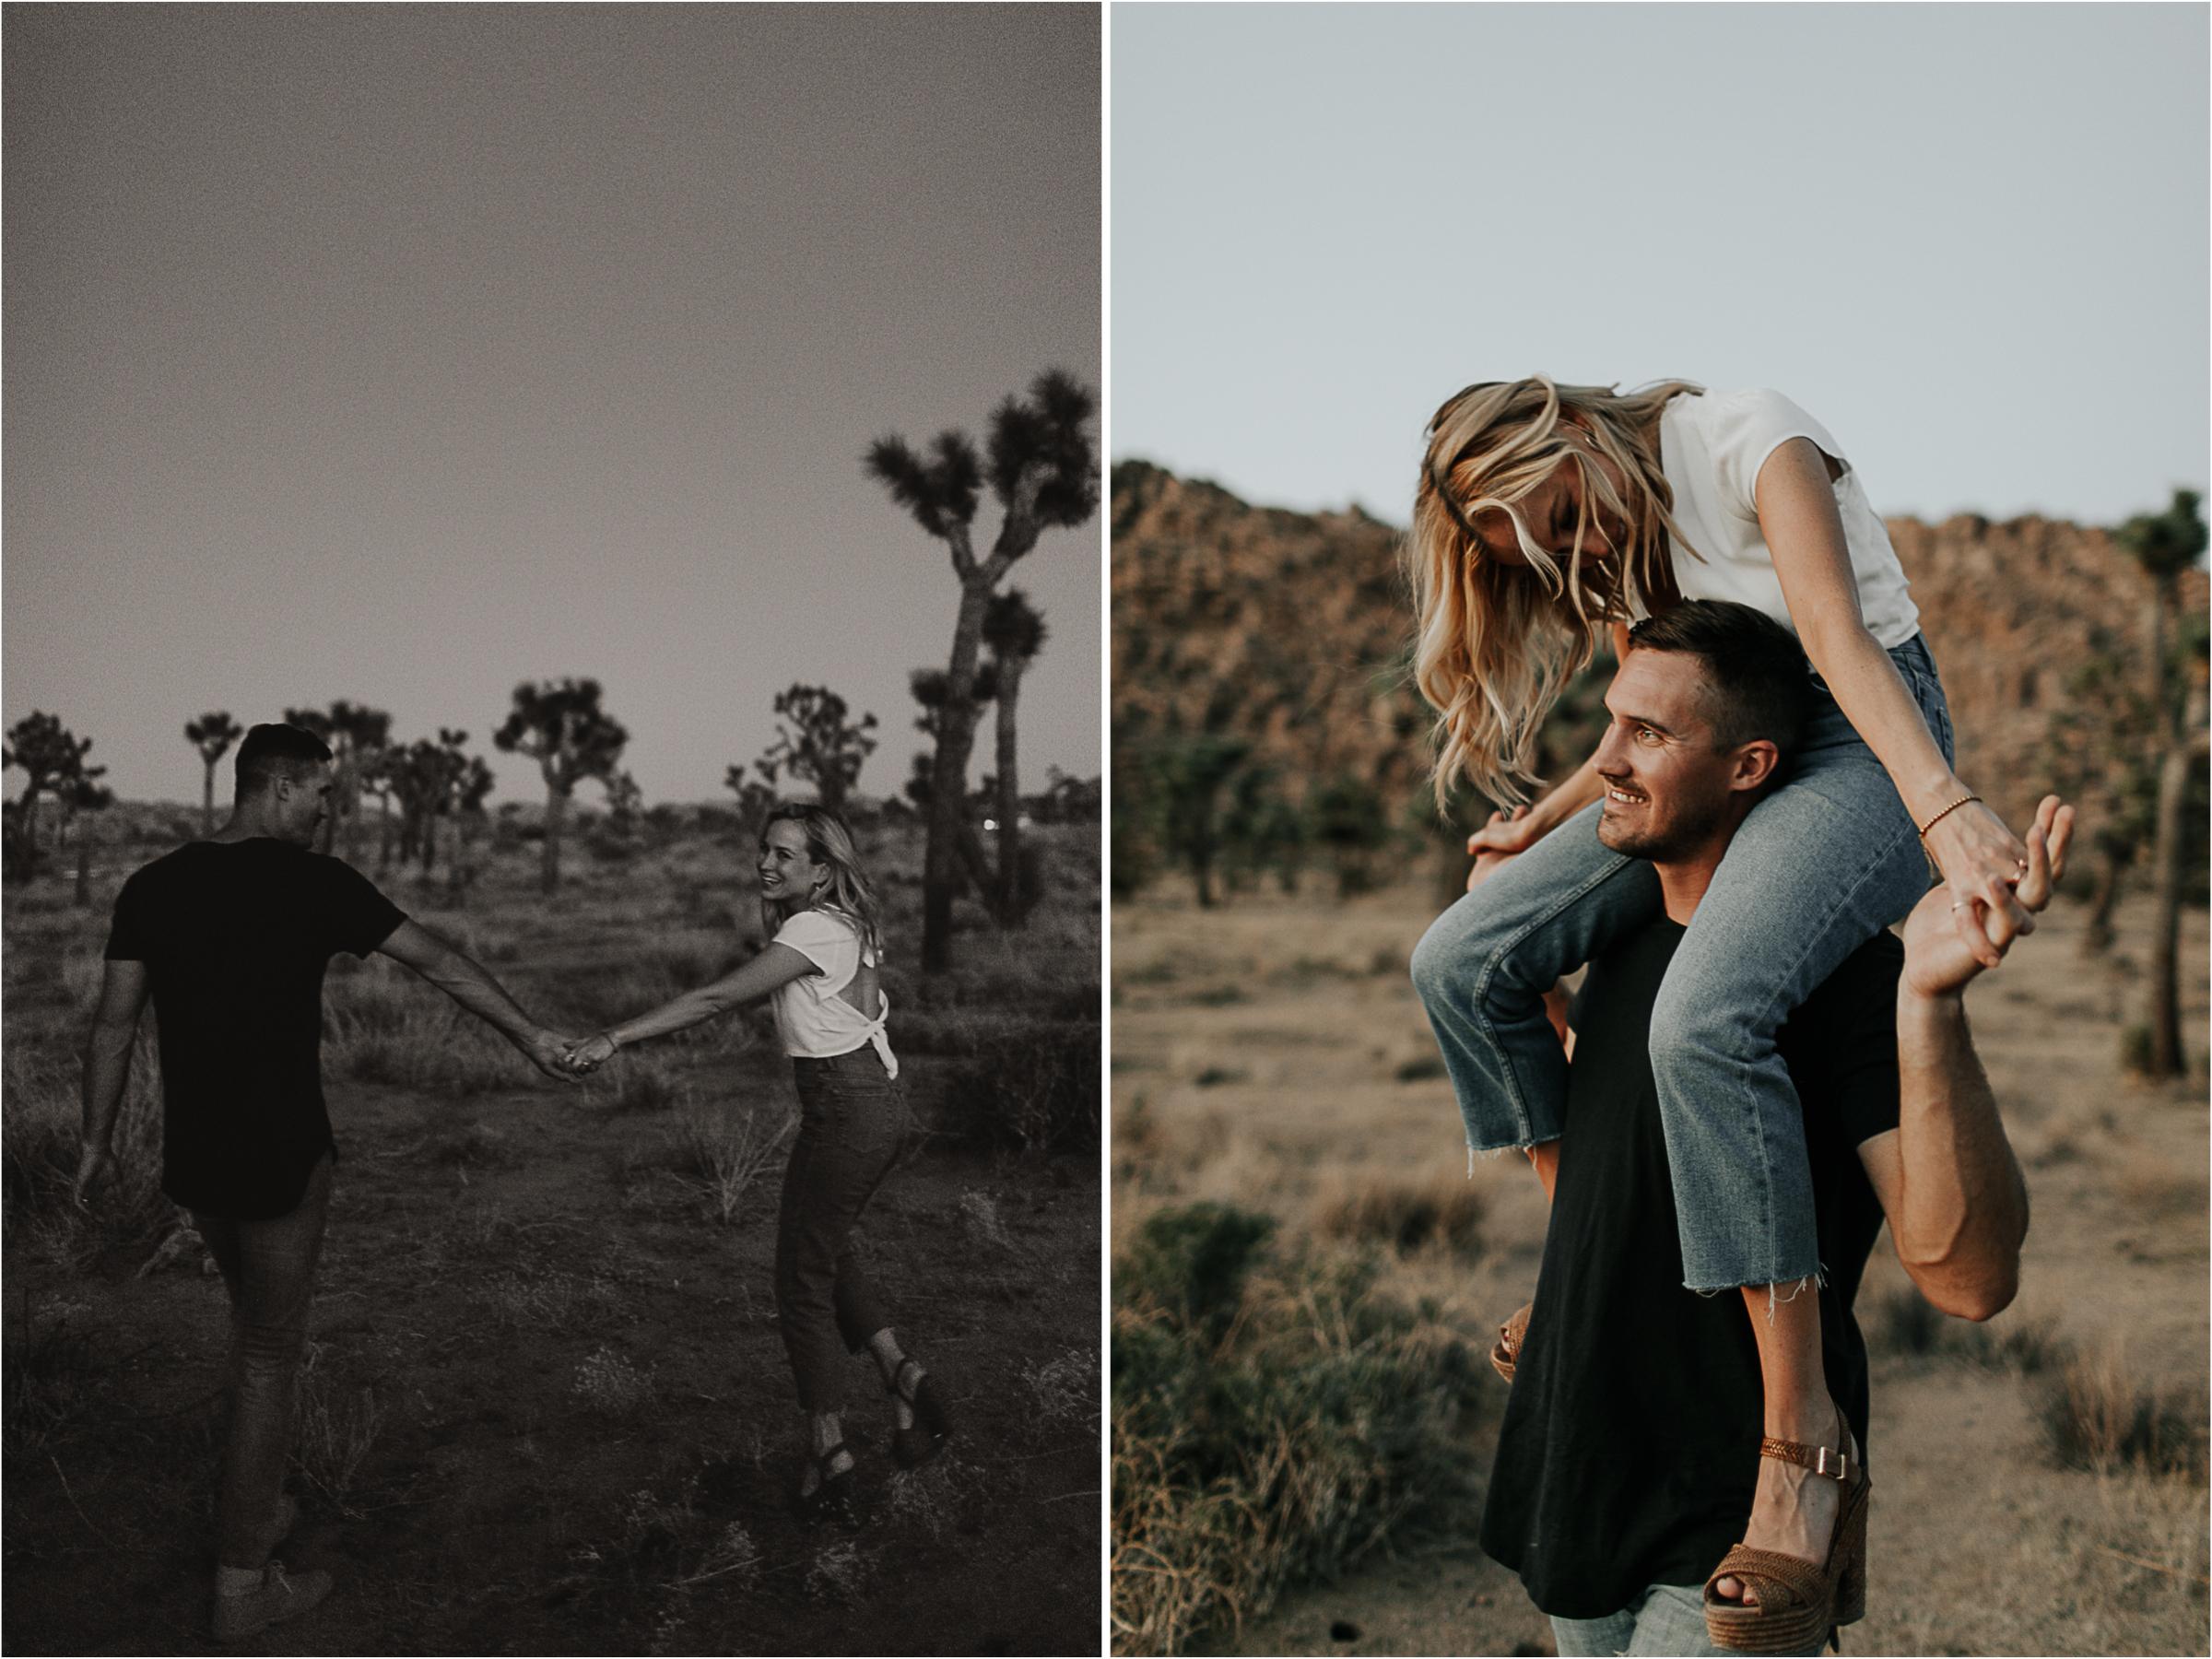 MelissaMarshall_Thrive Wildly Photography Workshop_10.jpg